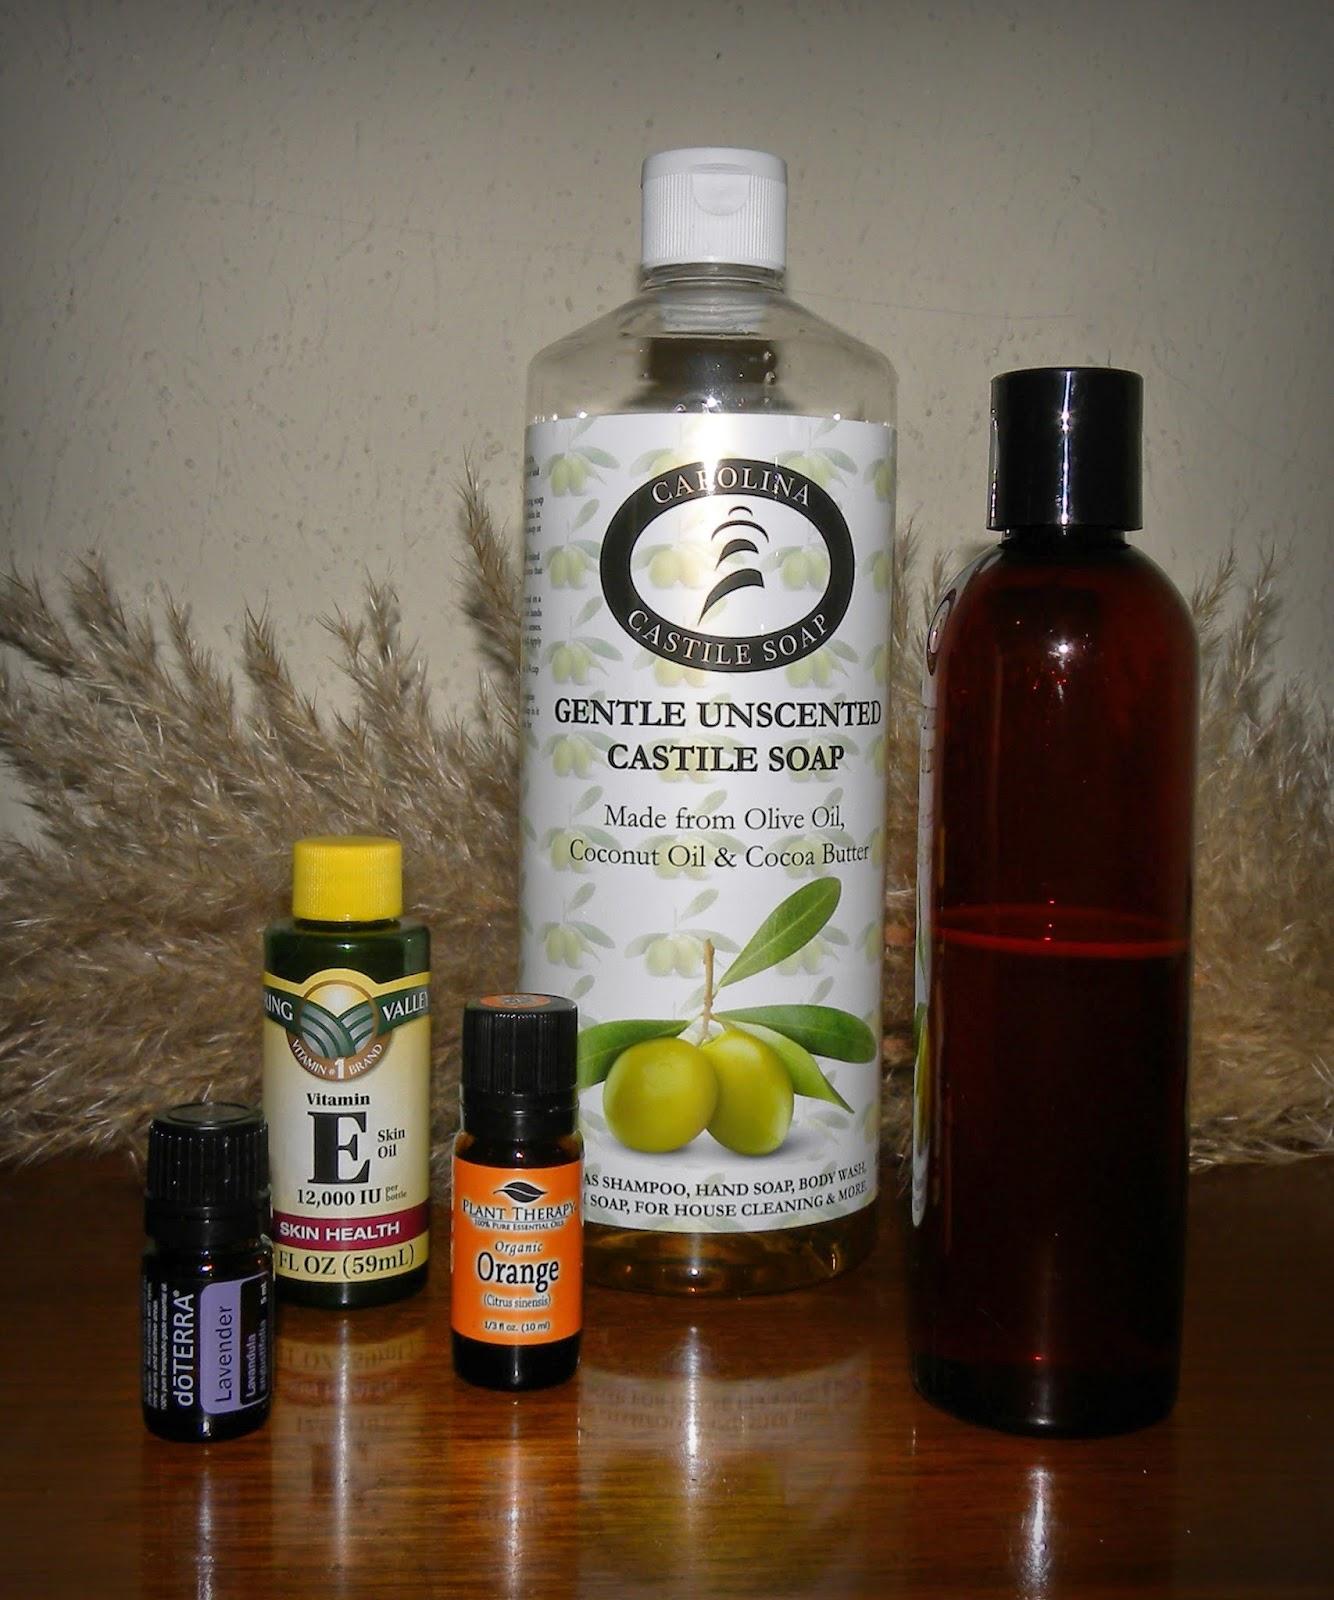 Castile soap shampoo review